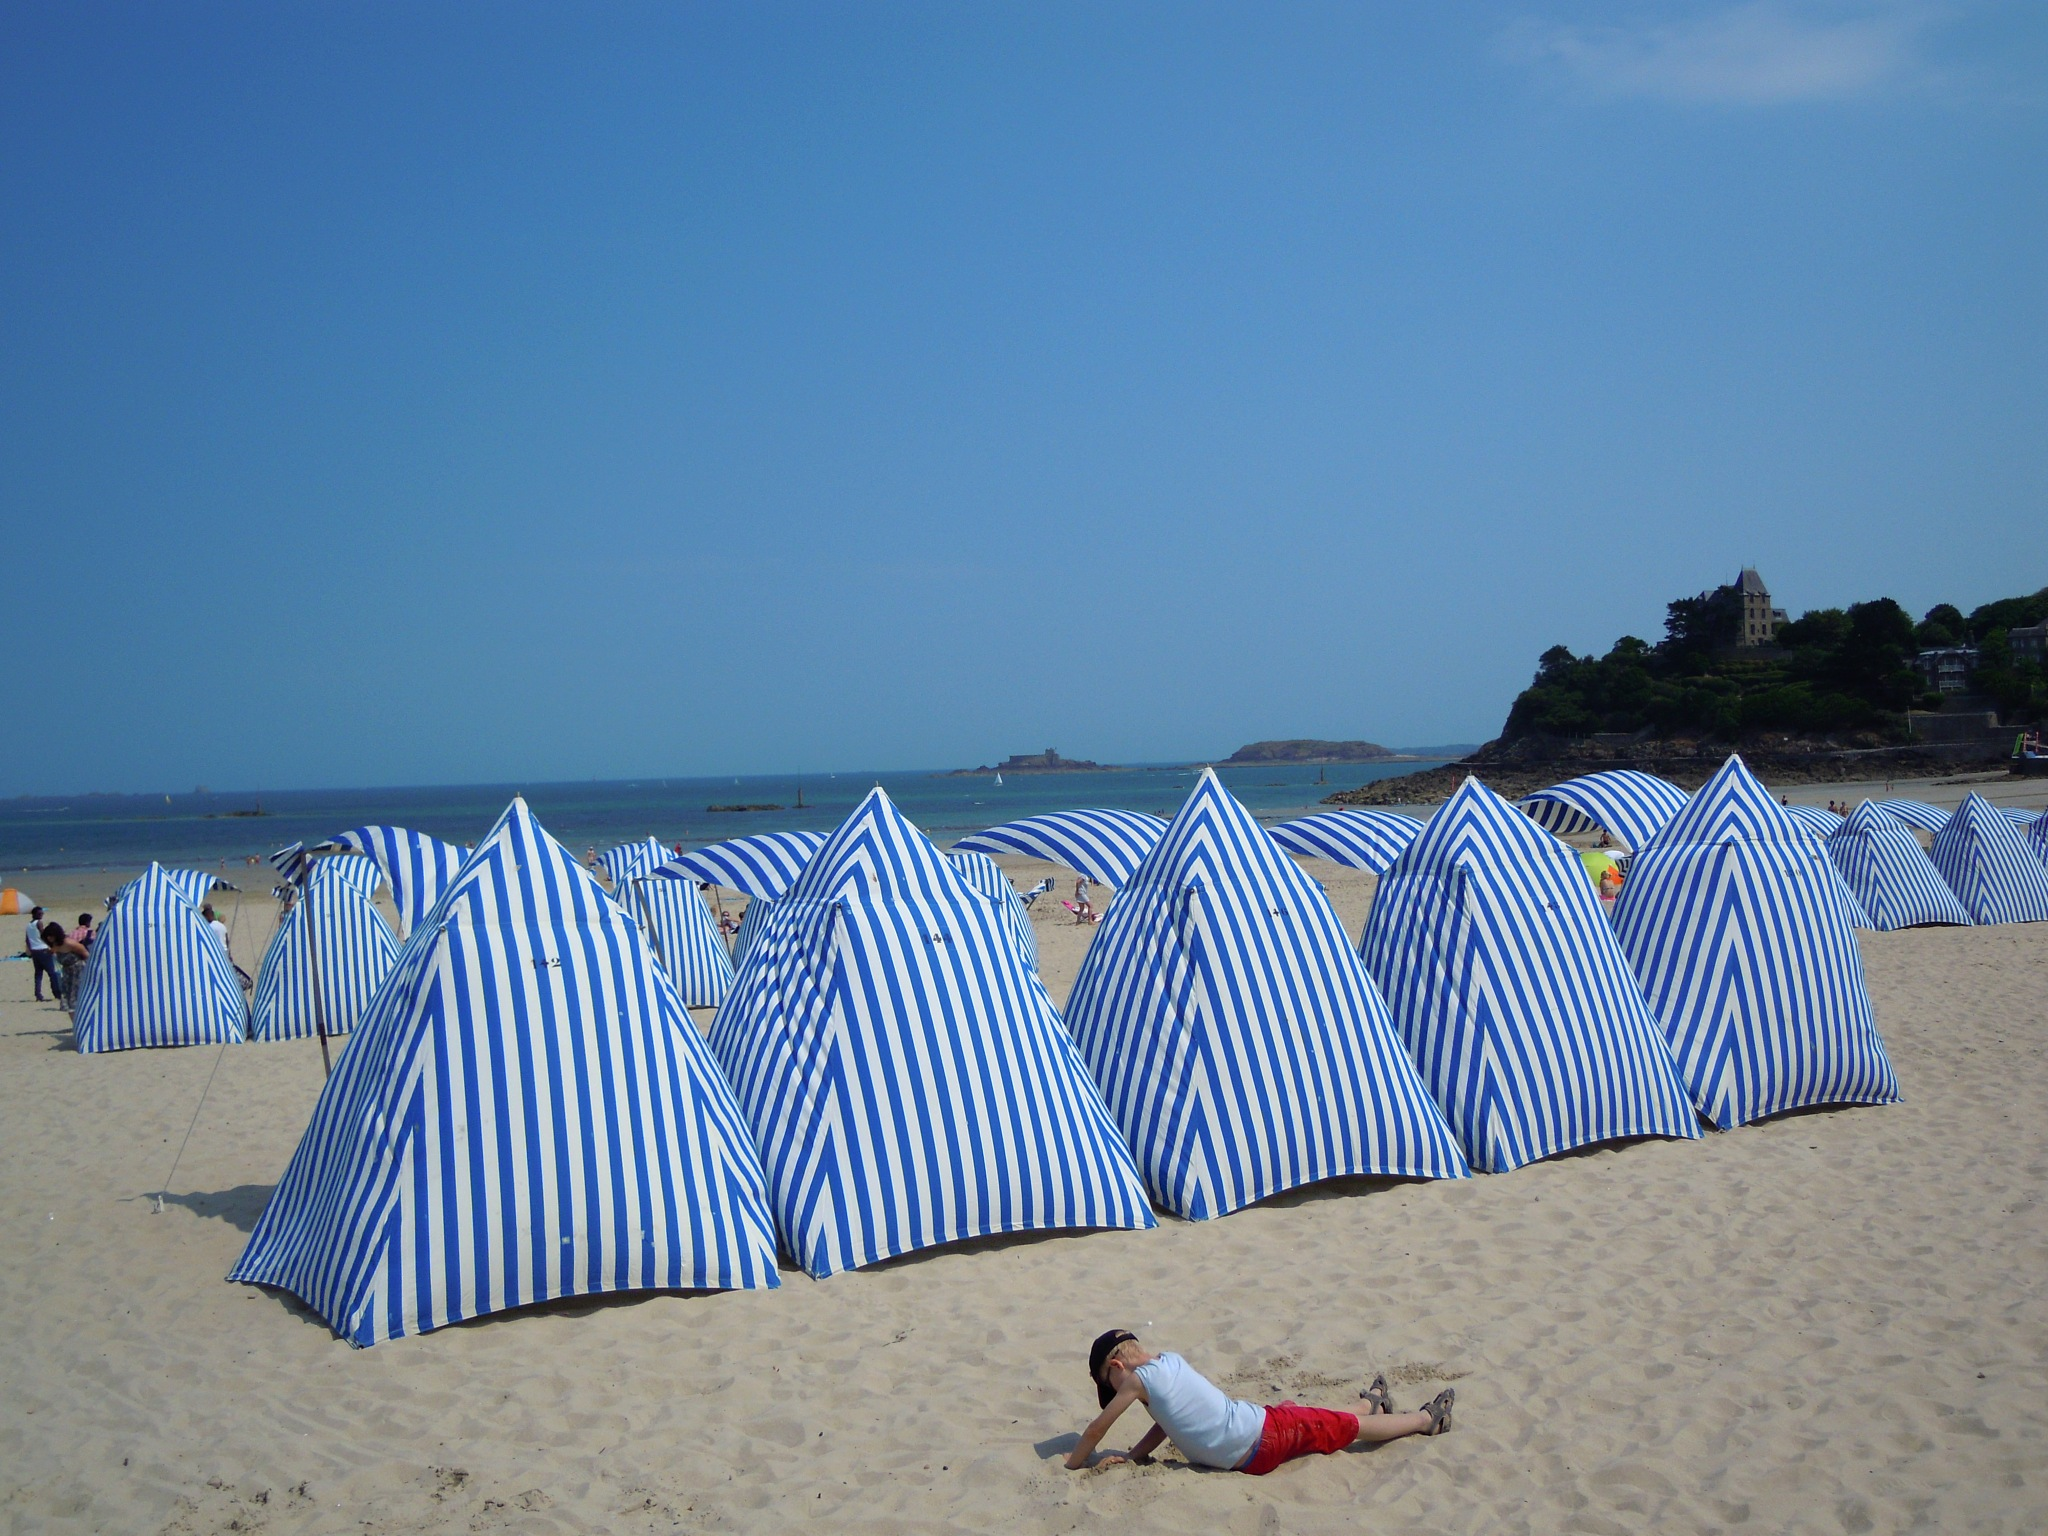 Beach tents in Dinard (Normandy) by Bice Portinari